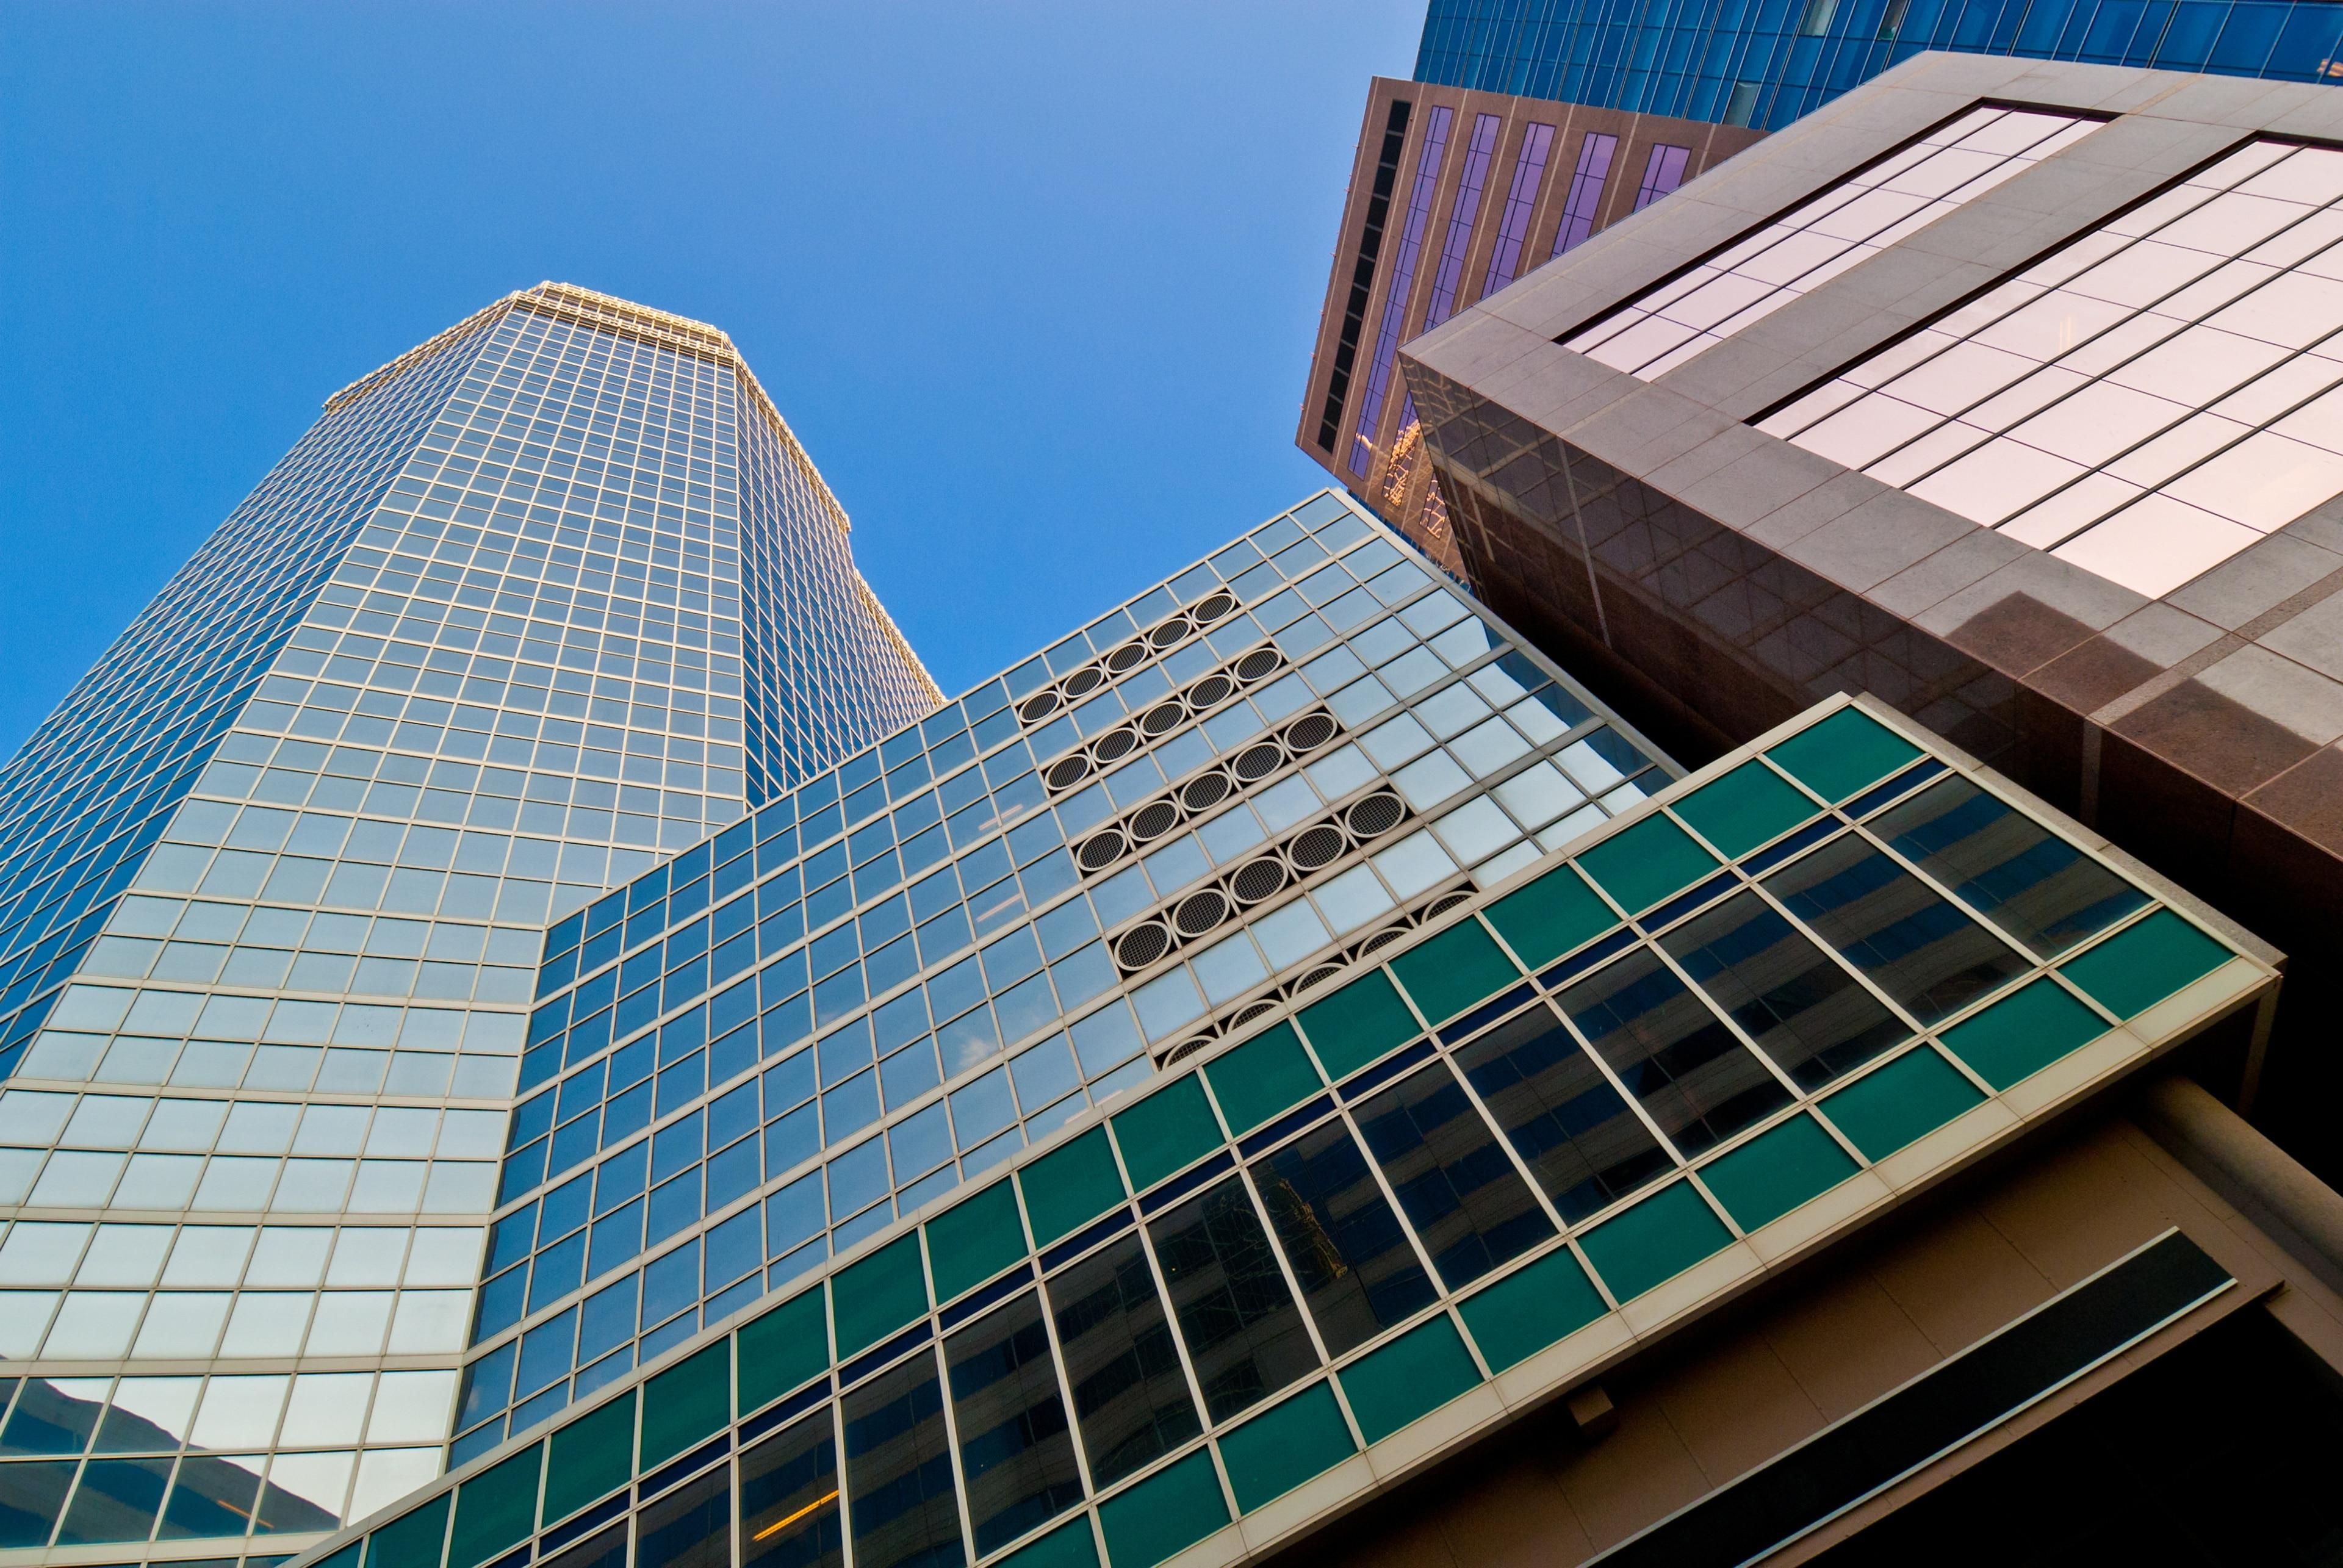 Texas Medical Center, Houston, Texas, United States of America